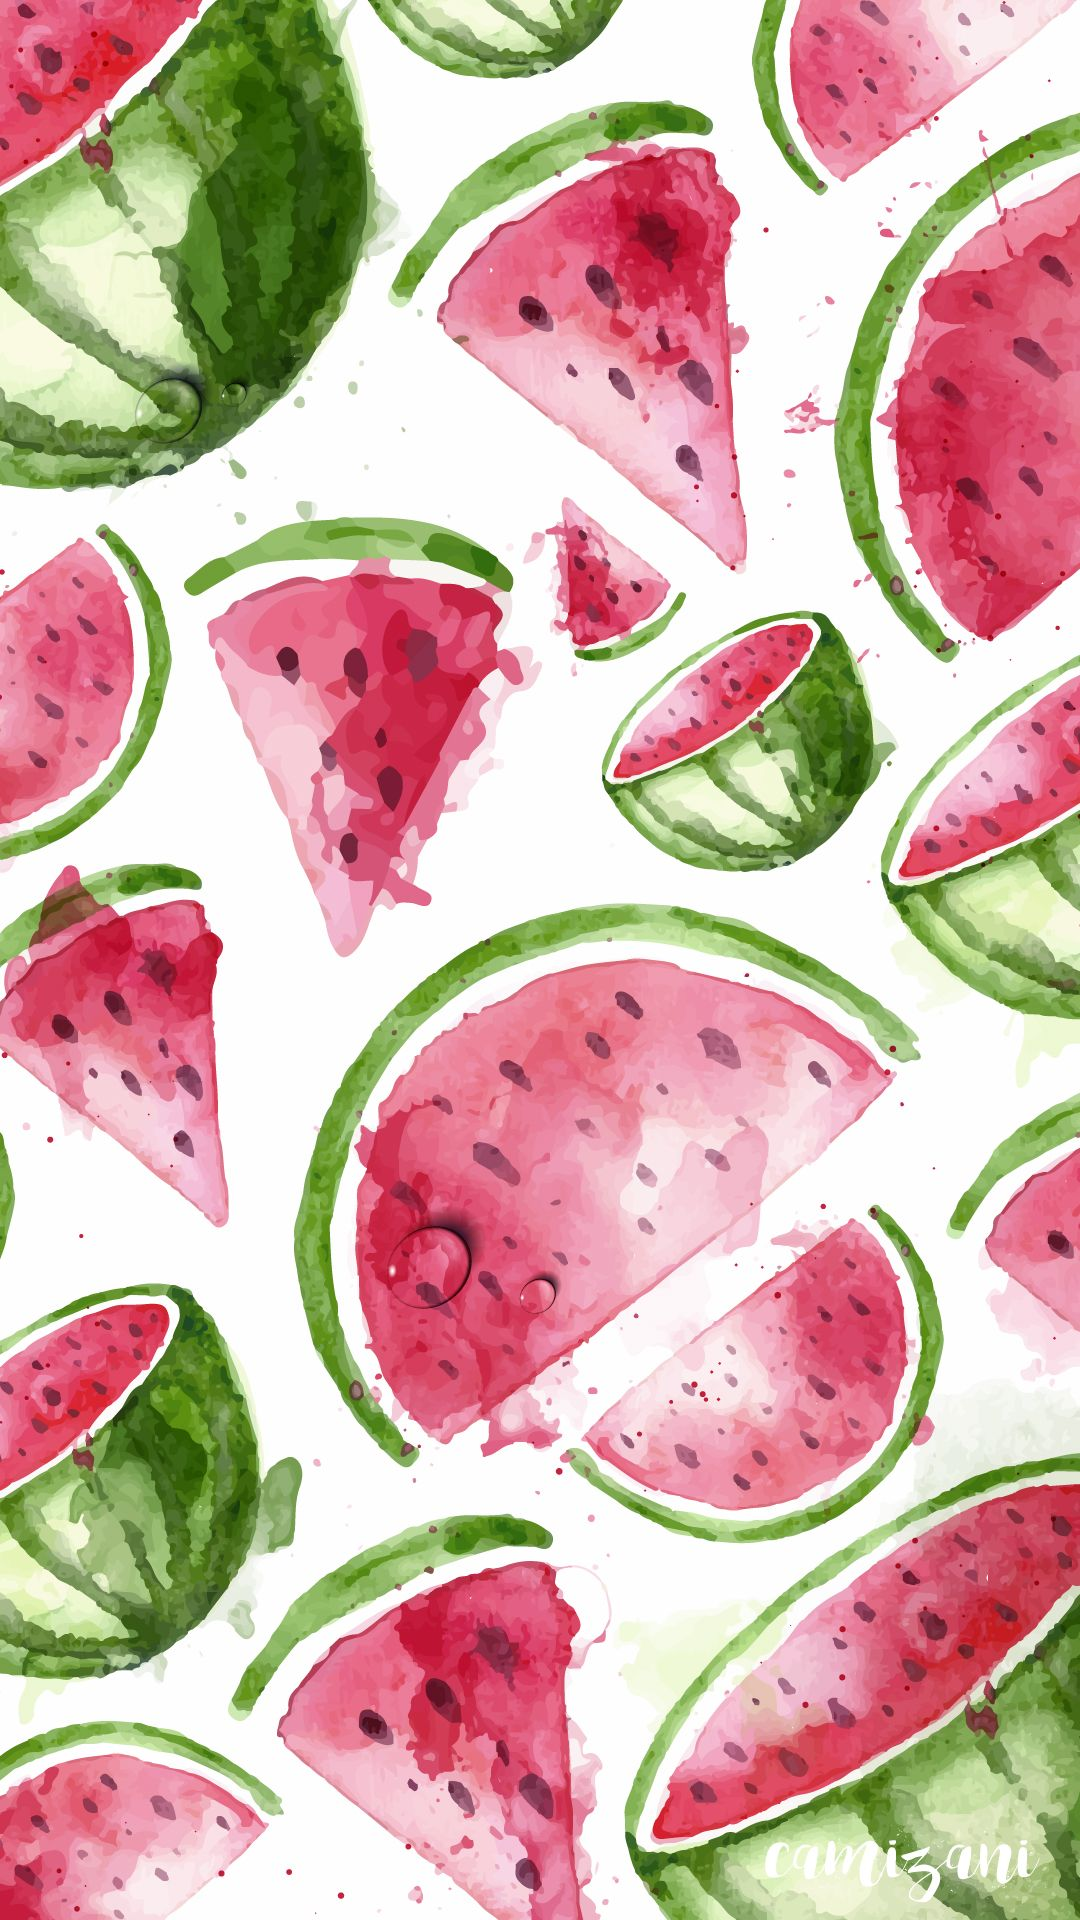 Camizani Watermelon Iphone Wallpaper Watermelon Wallpaper Summer Wallpaper Iphone Wallpaper